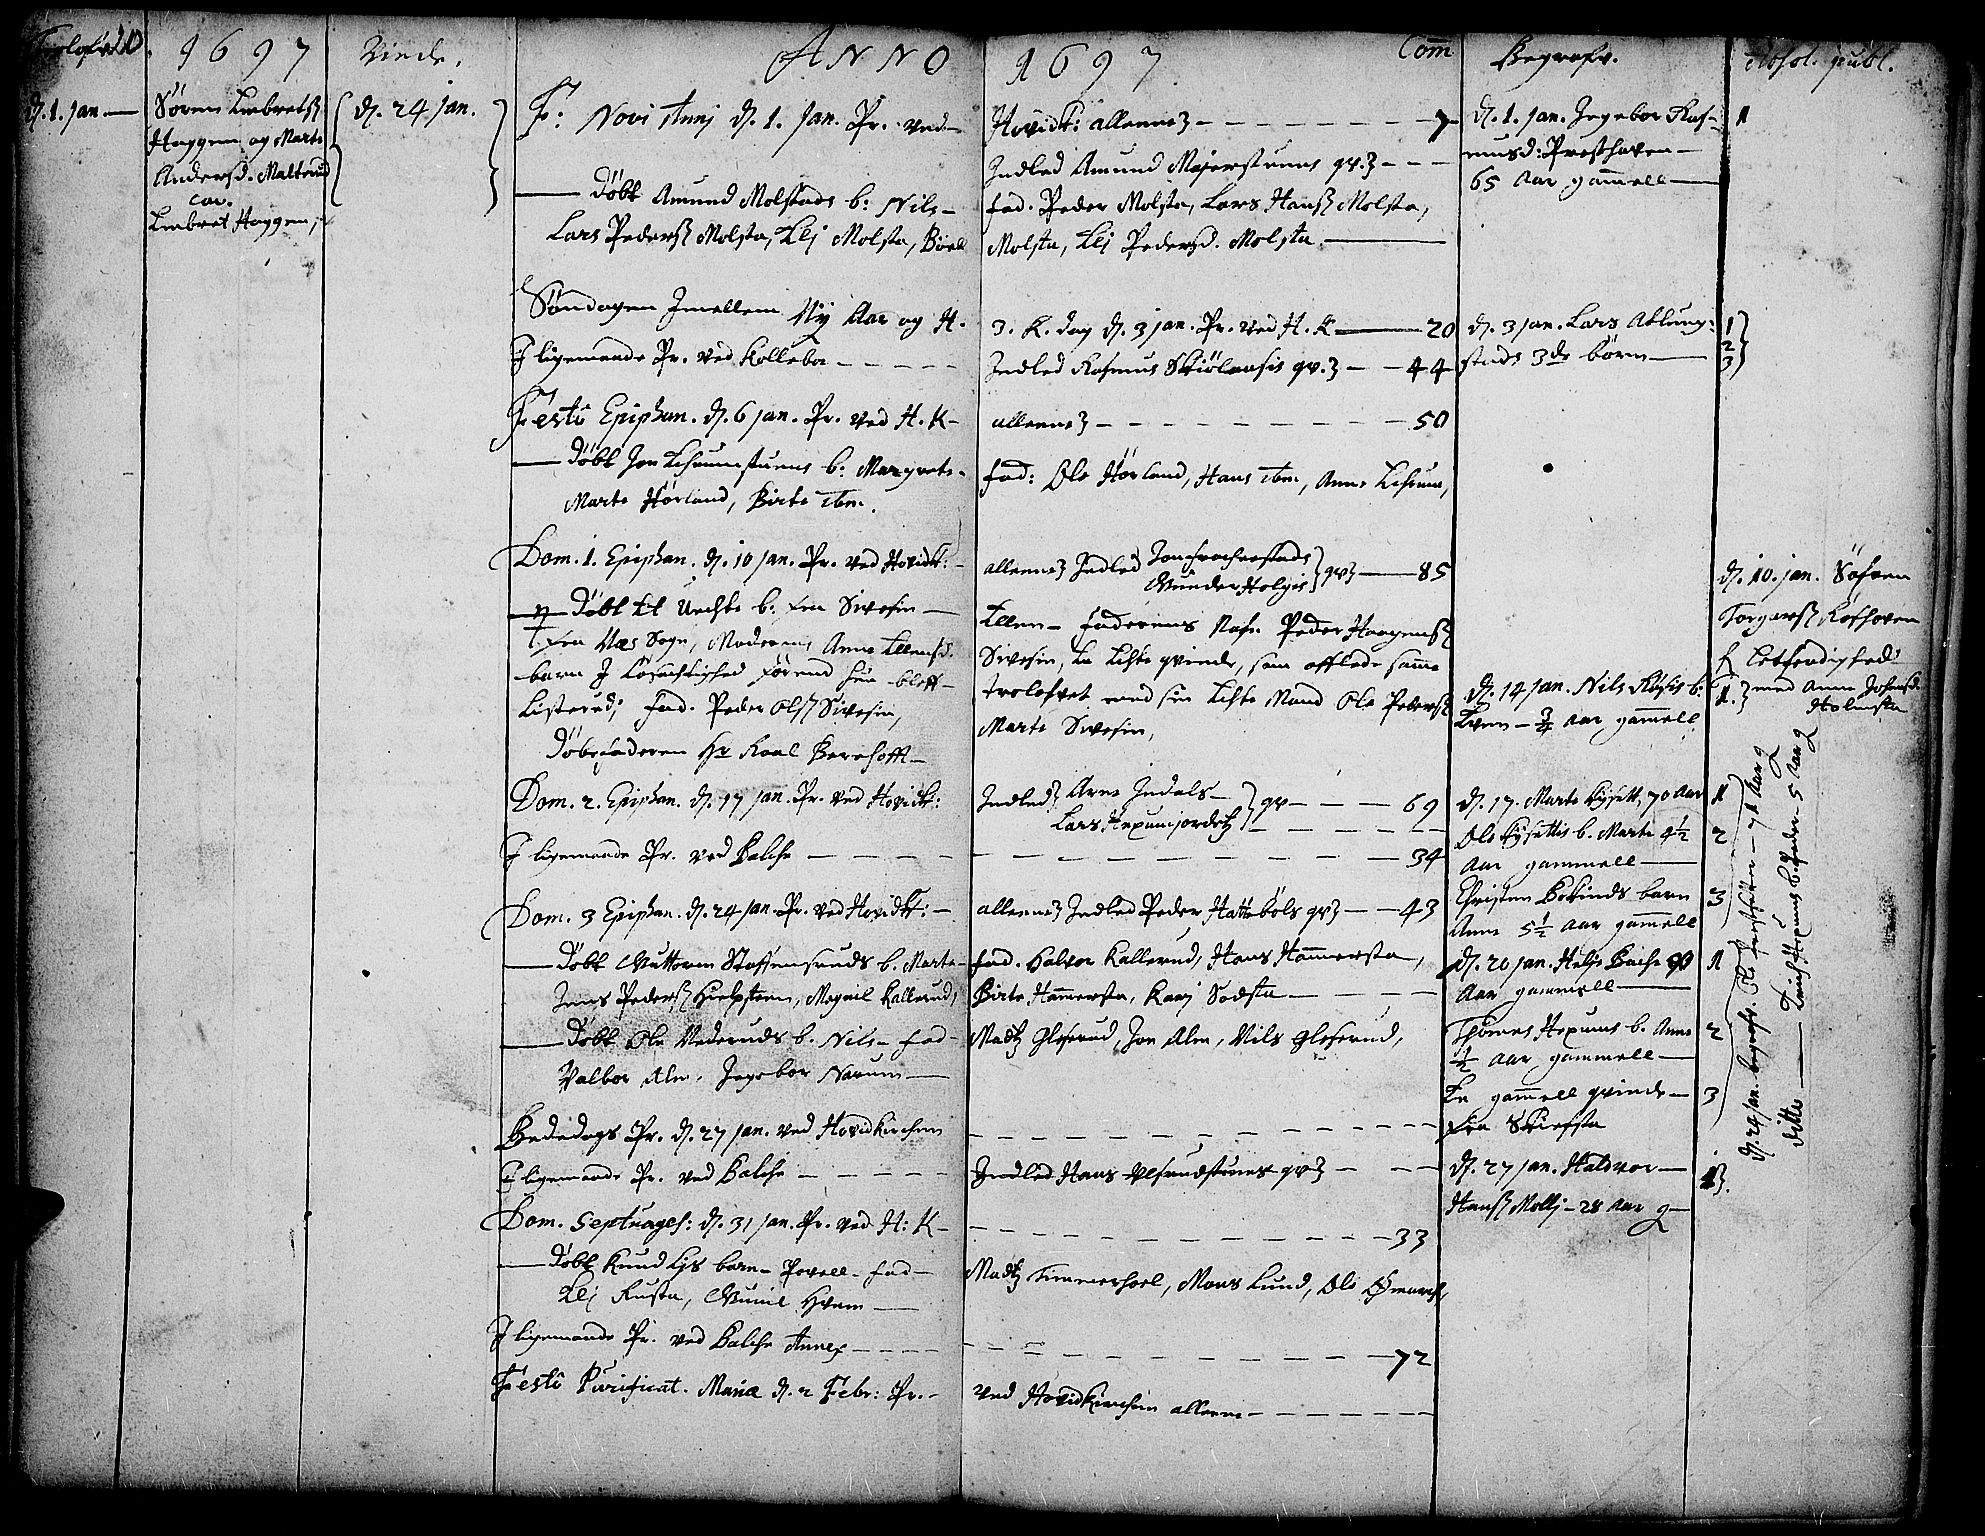 SAH, Toten prestekontor, Ministerialbok nr. 1, 1695-1713, s. 20